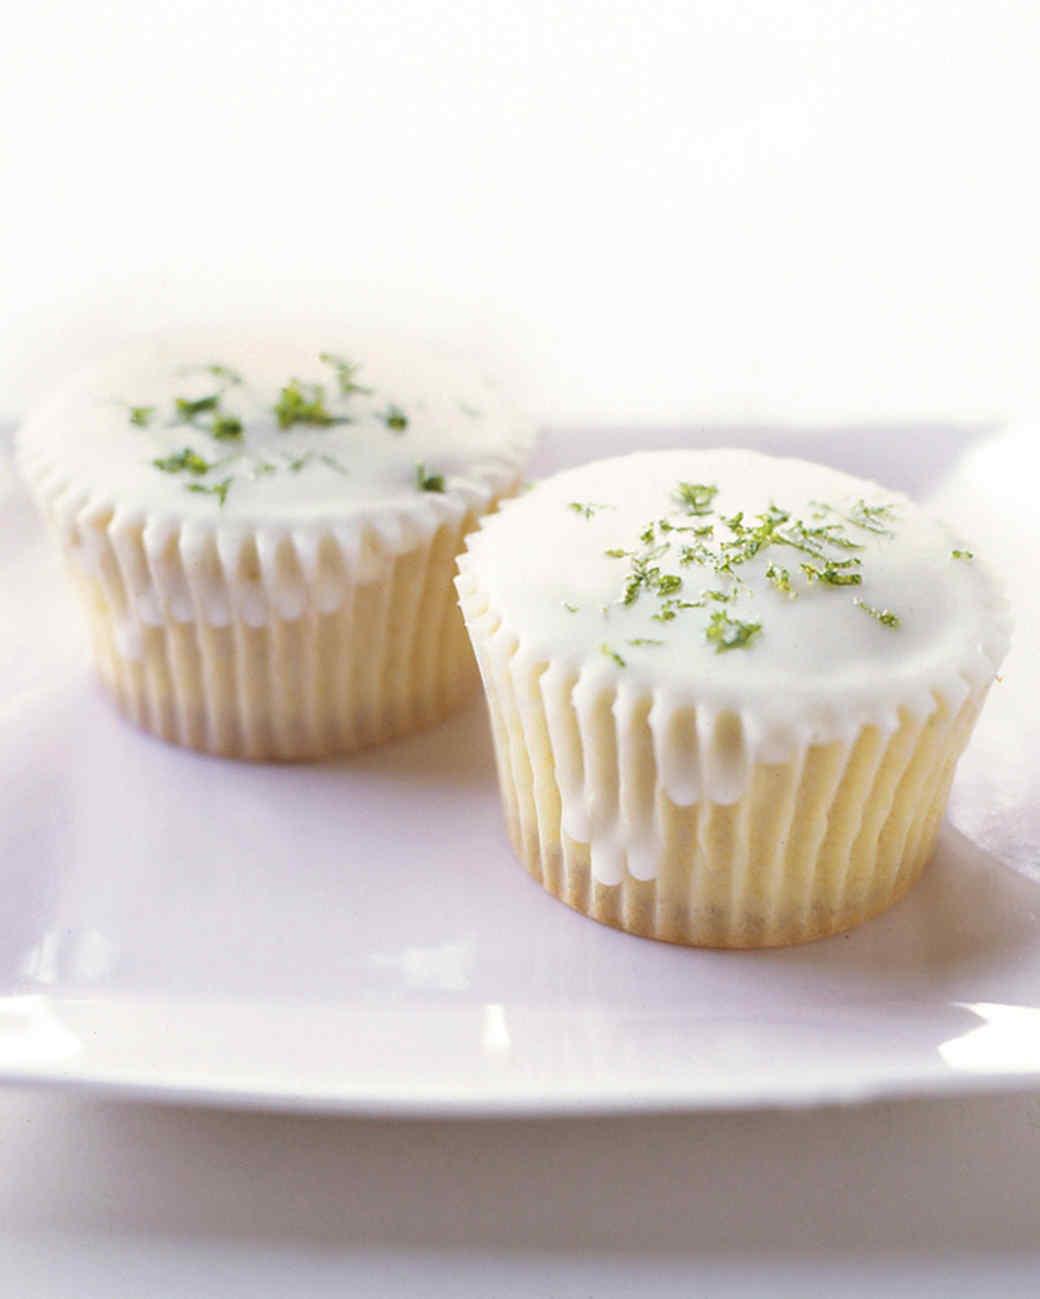 Triple-Citrus Cupcakes